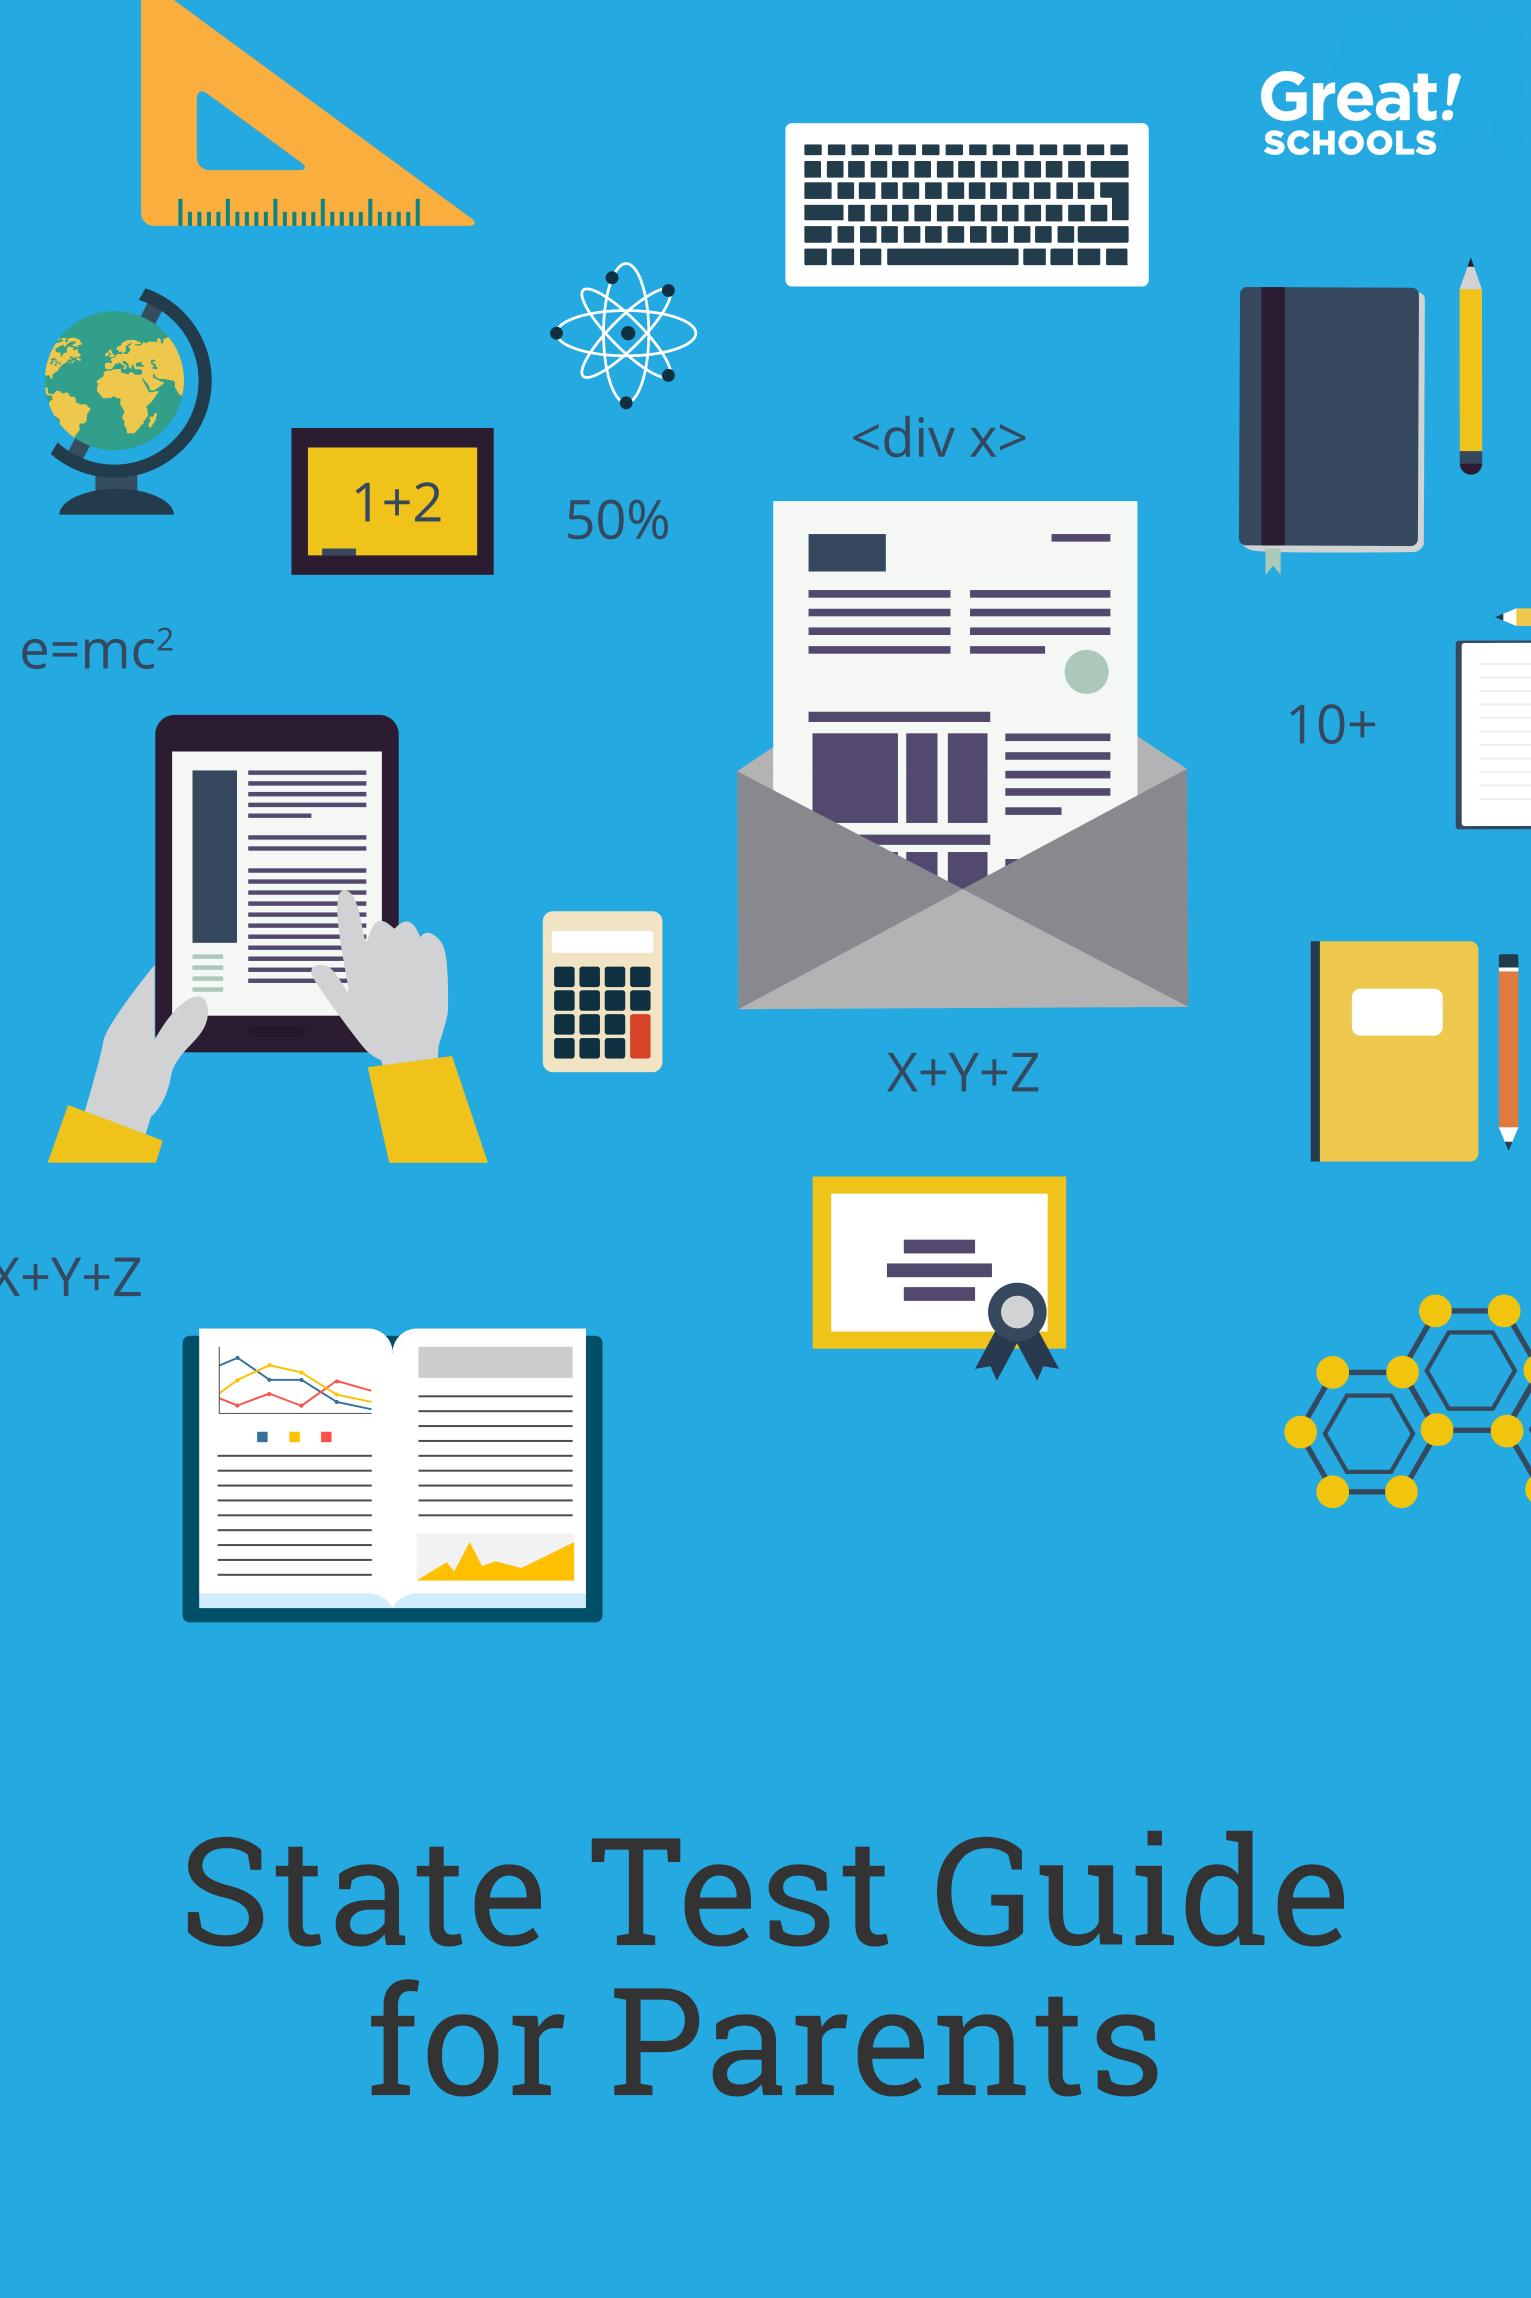 Worksheet Grade Schools.org greatschools state test guide for parents partner toolkit pinterest assets